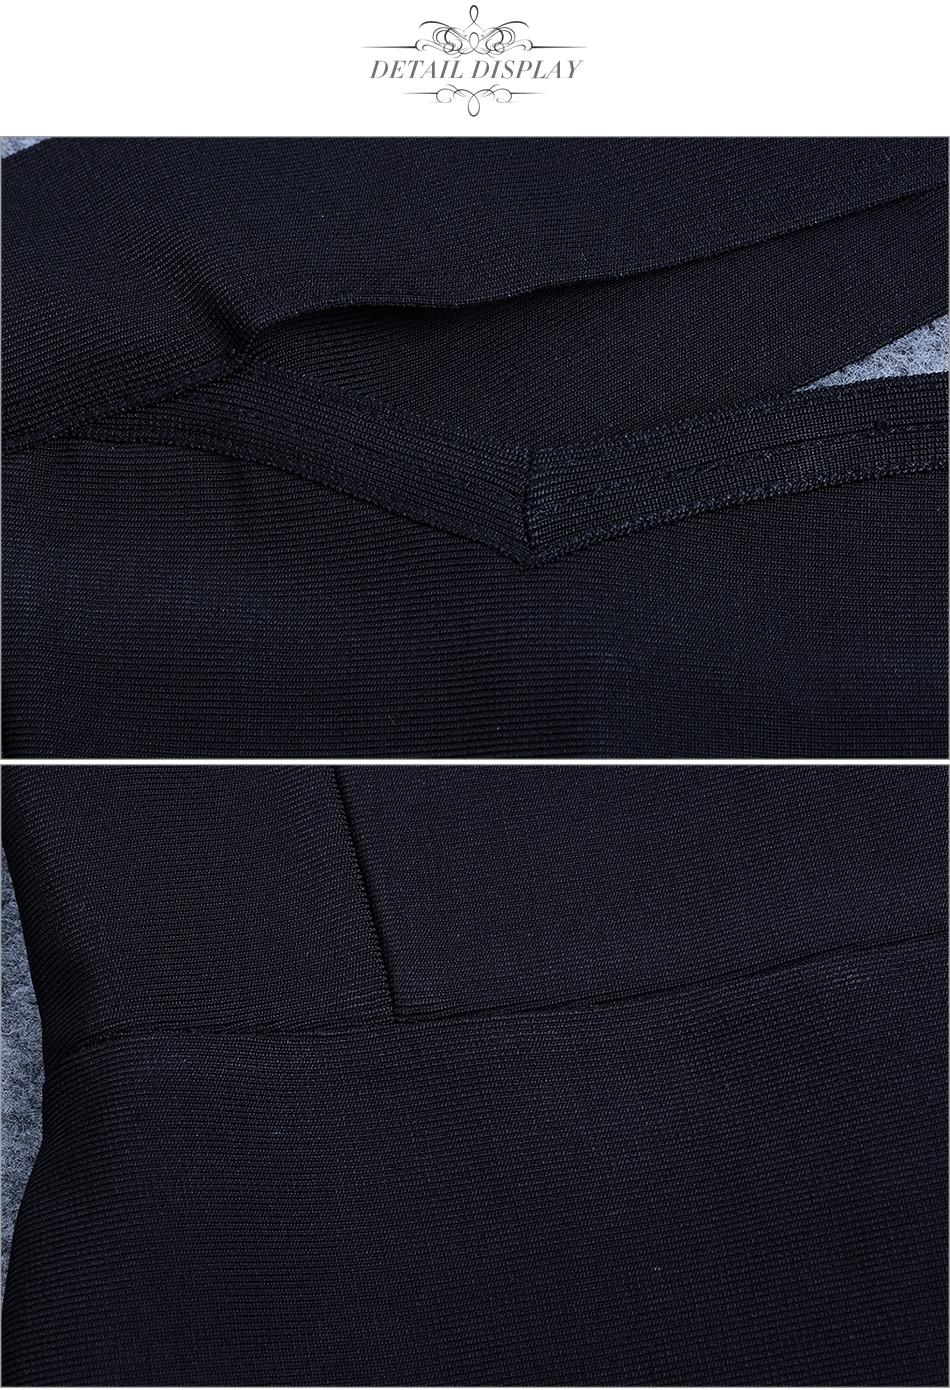 Adyce White Blue Bodycon Bandage Dress Women 2021 Summer Sexy Elegant Black One Shoulder Strapless Celebrity Runway Party Dress